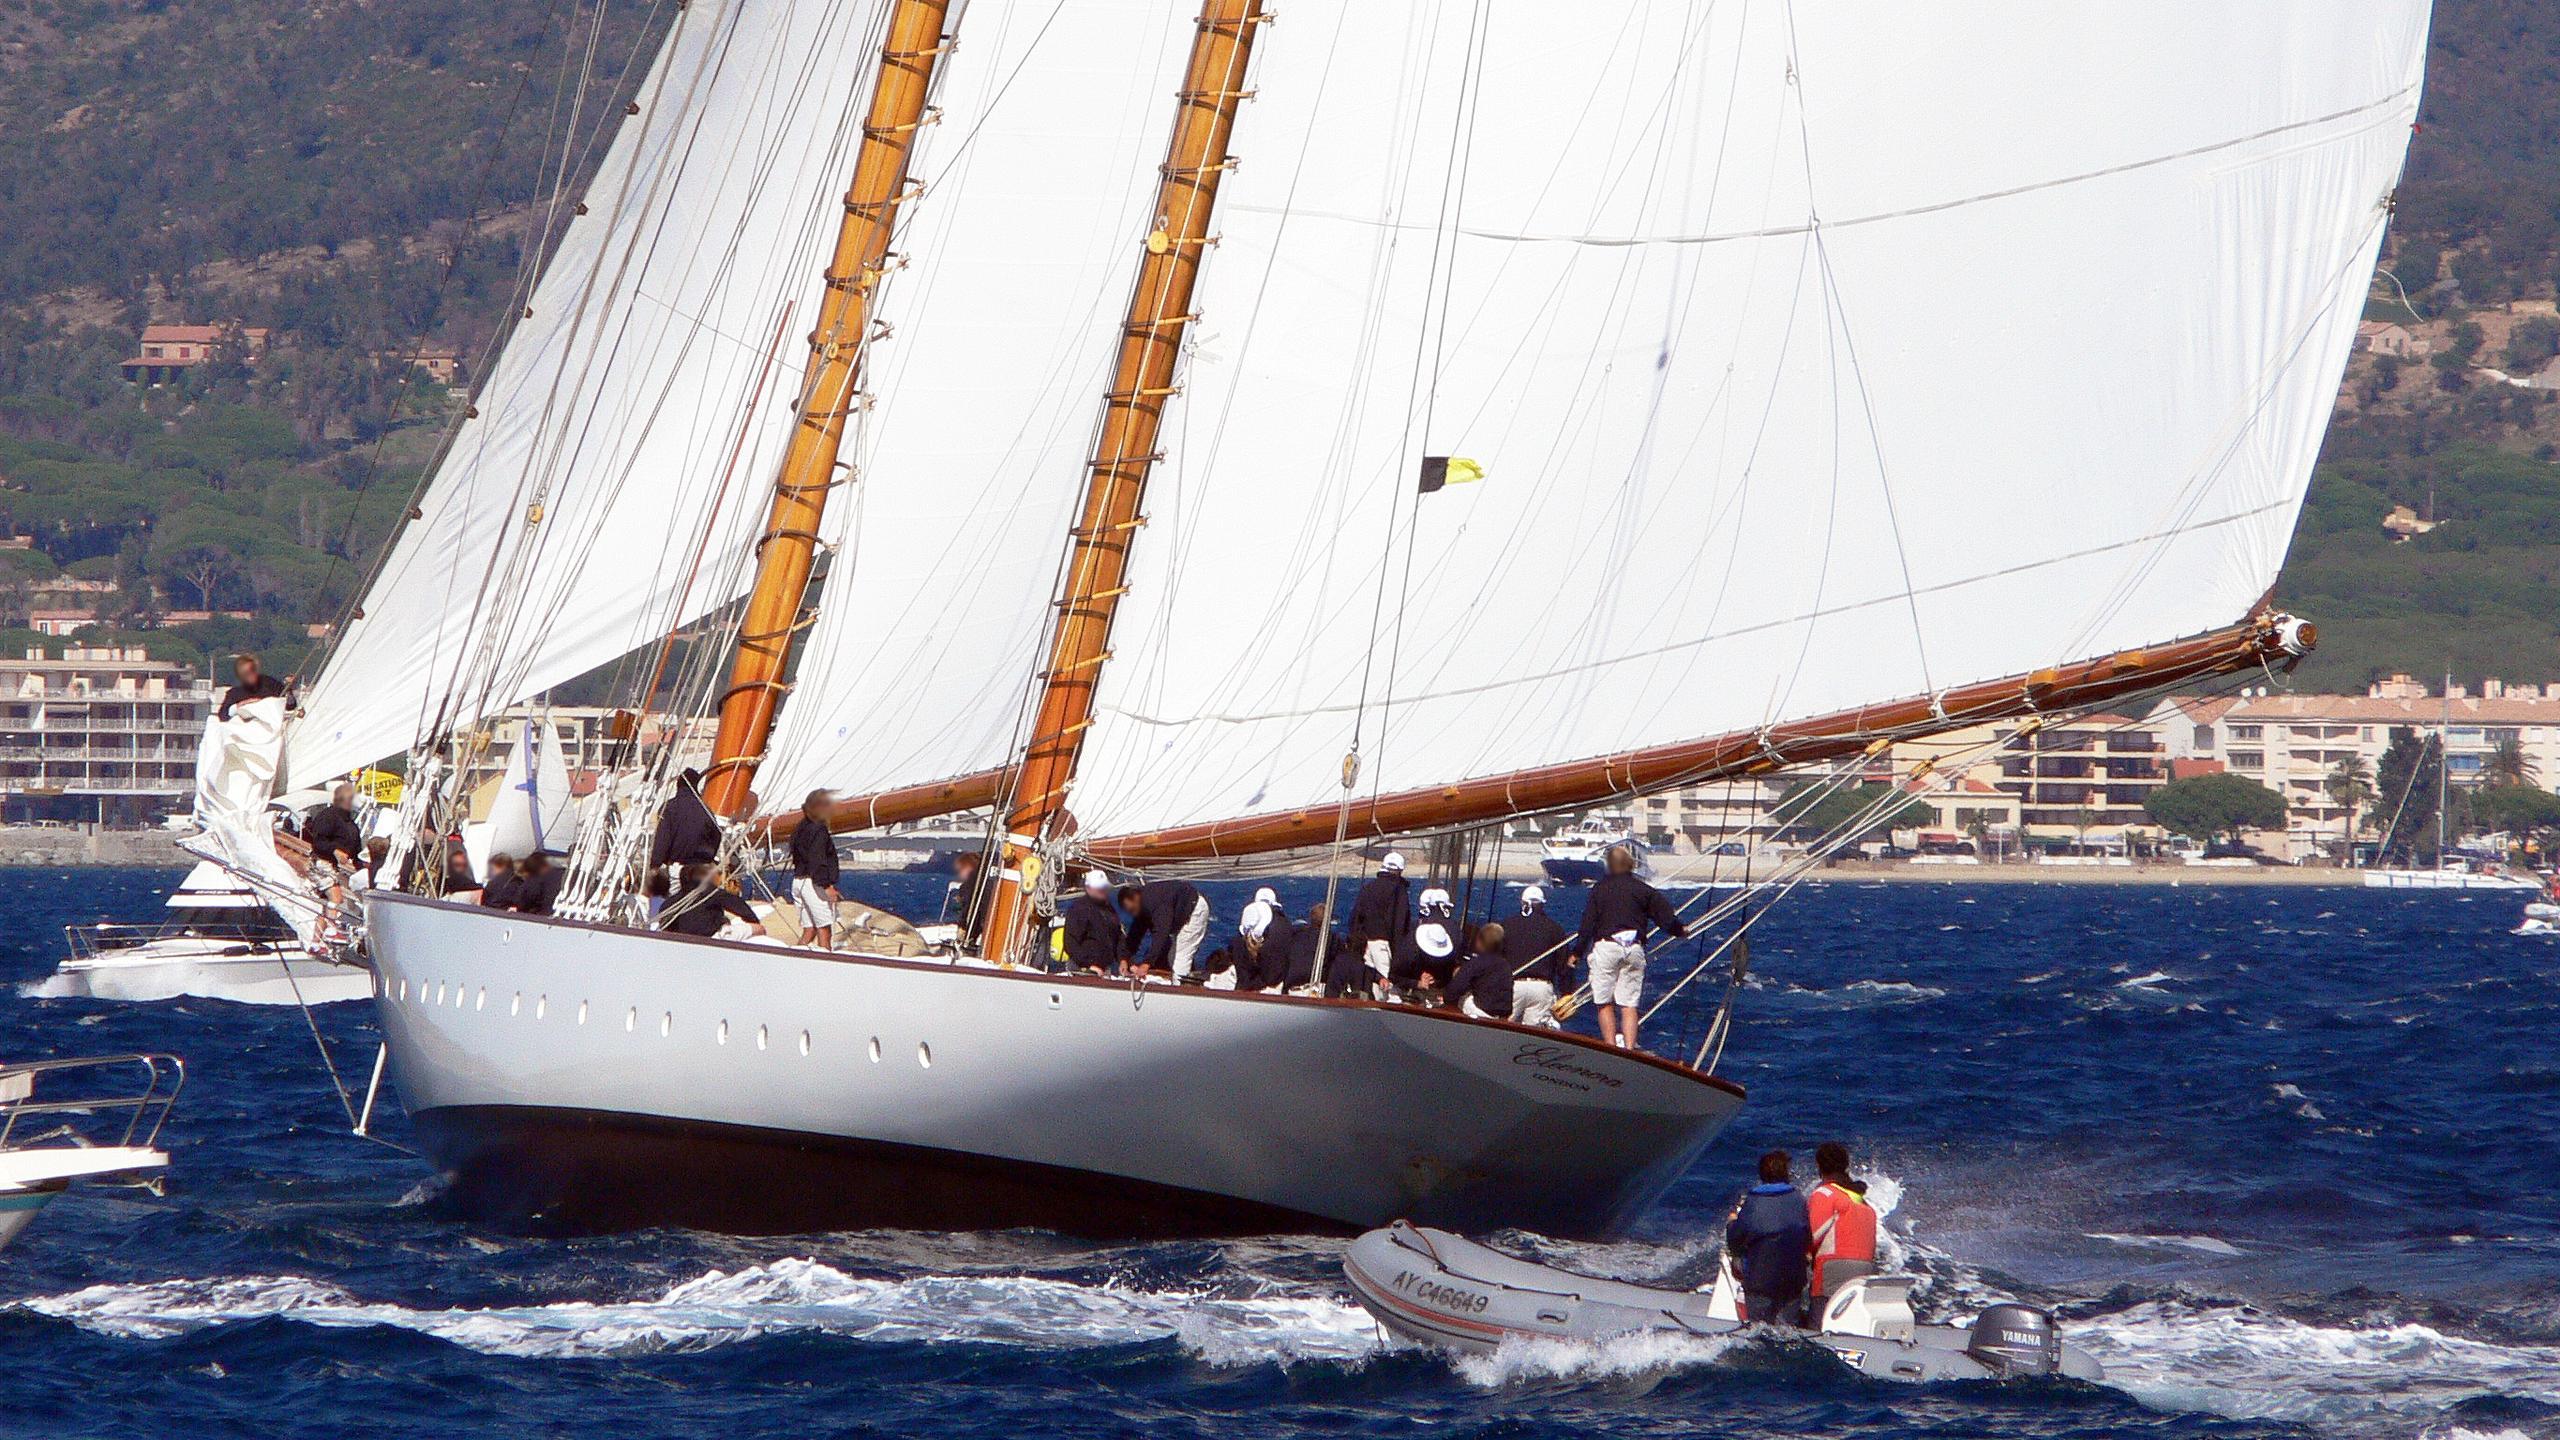 eleonora-e-sailing-yacht-van-der-graaf-2000-59m-stern